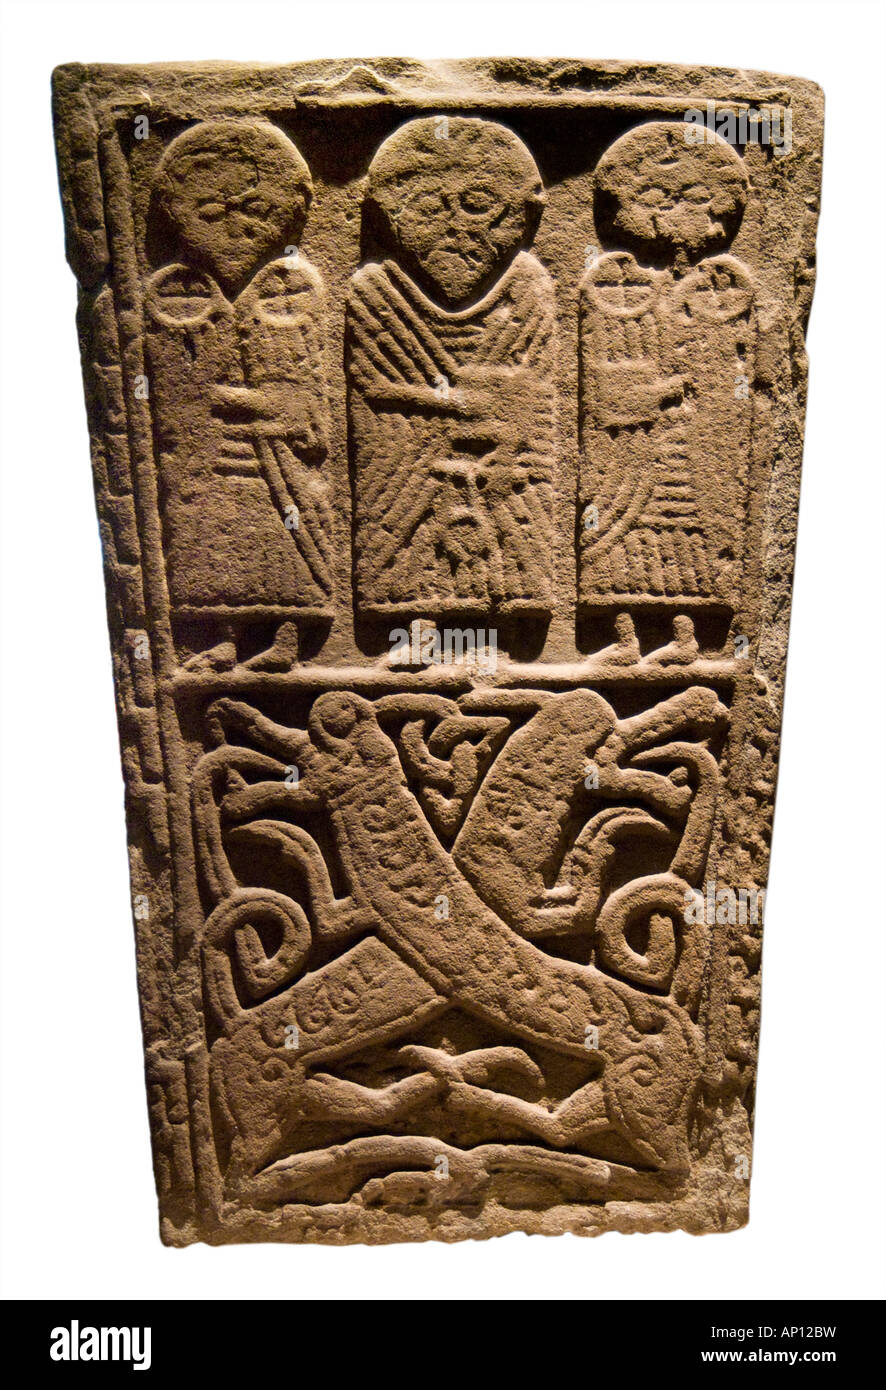 Stone tablet saint scotland scot scottish celt celtic